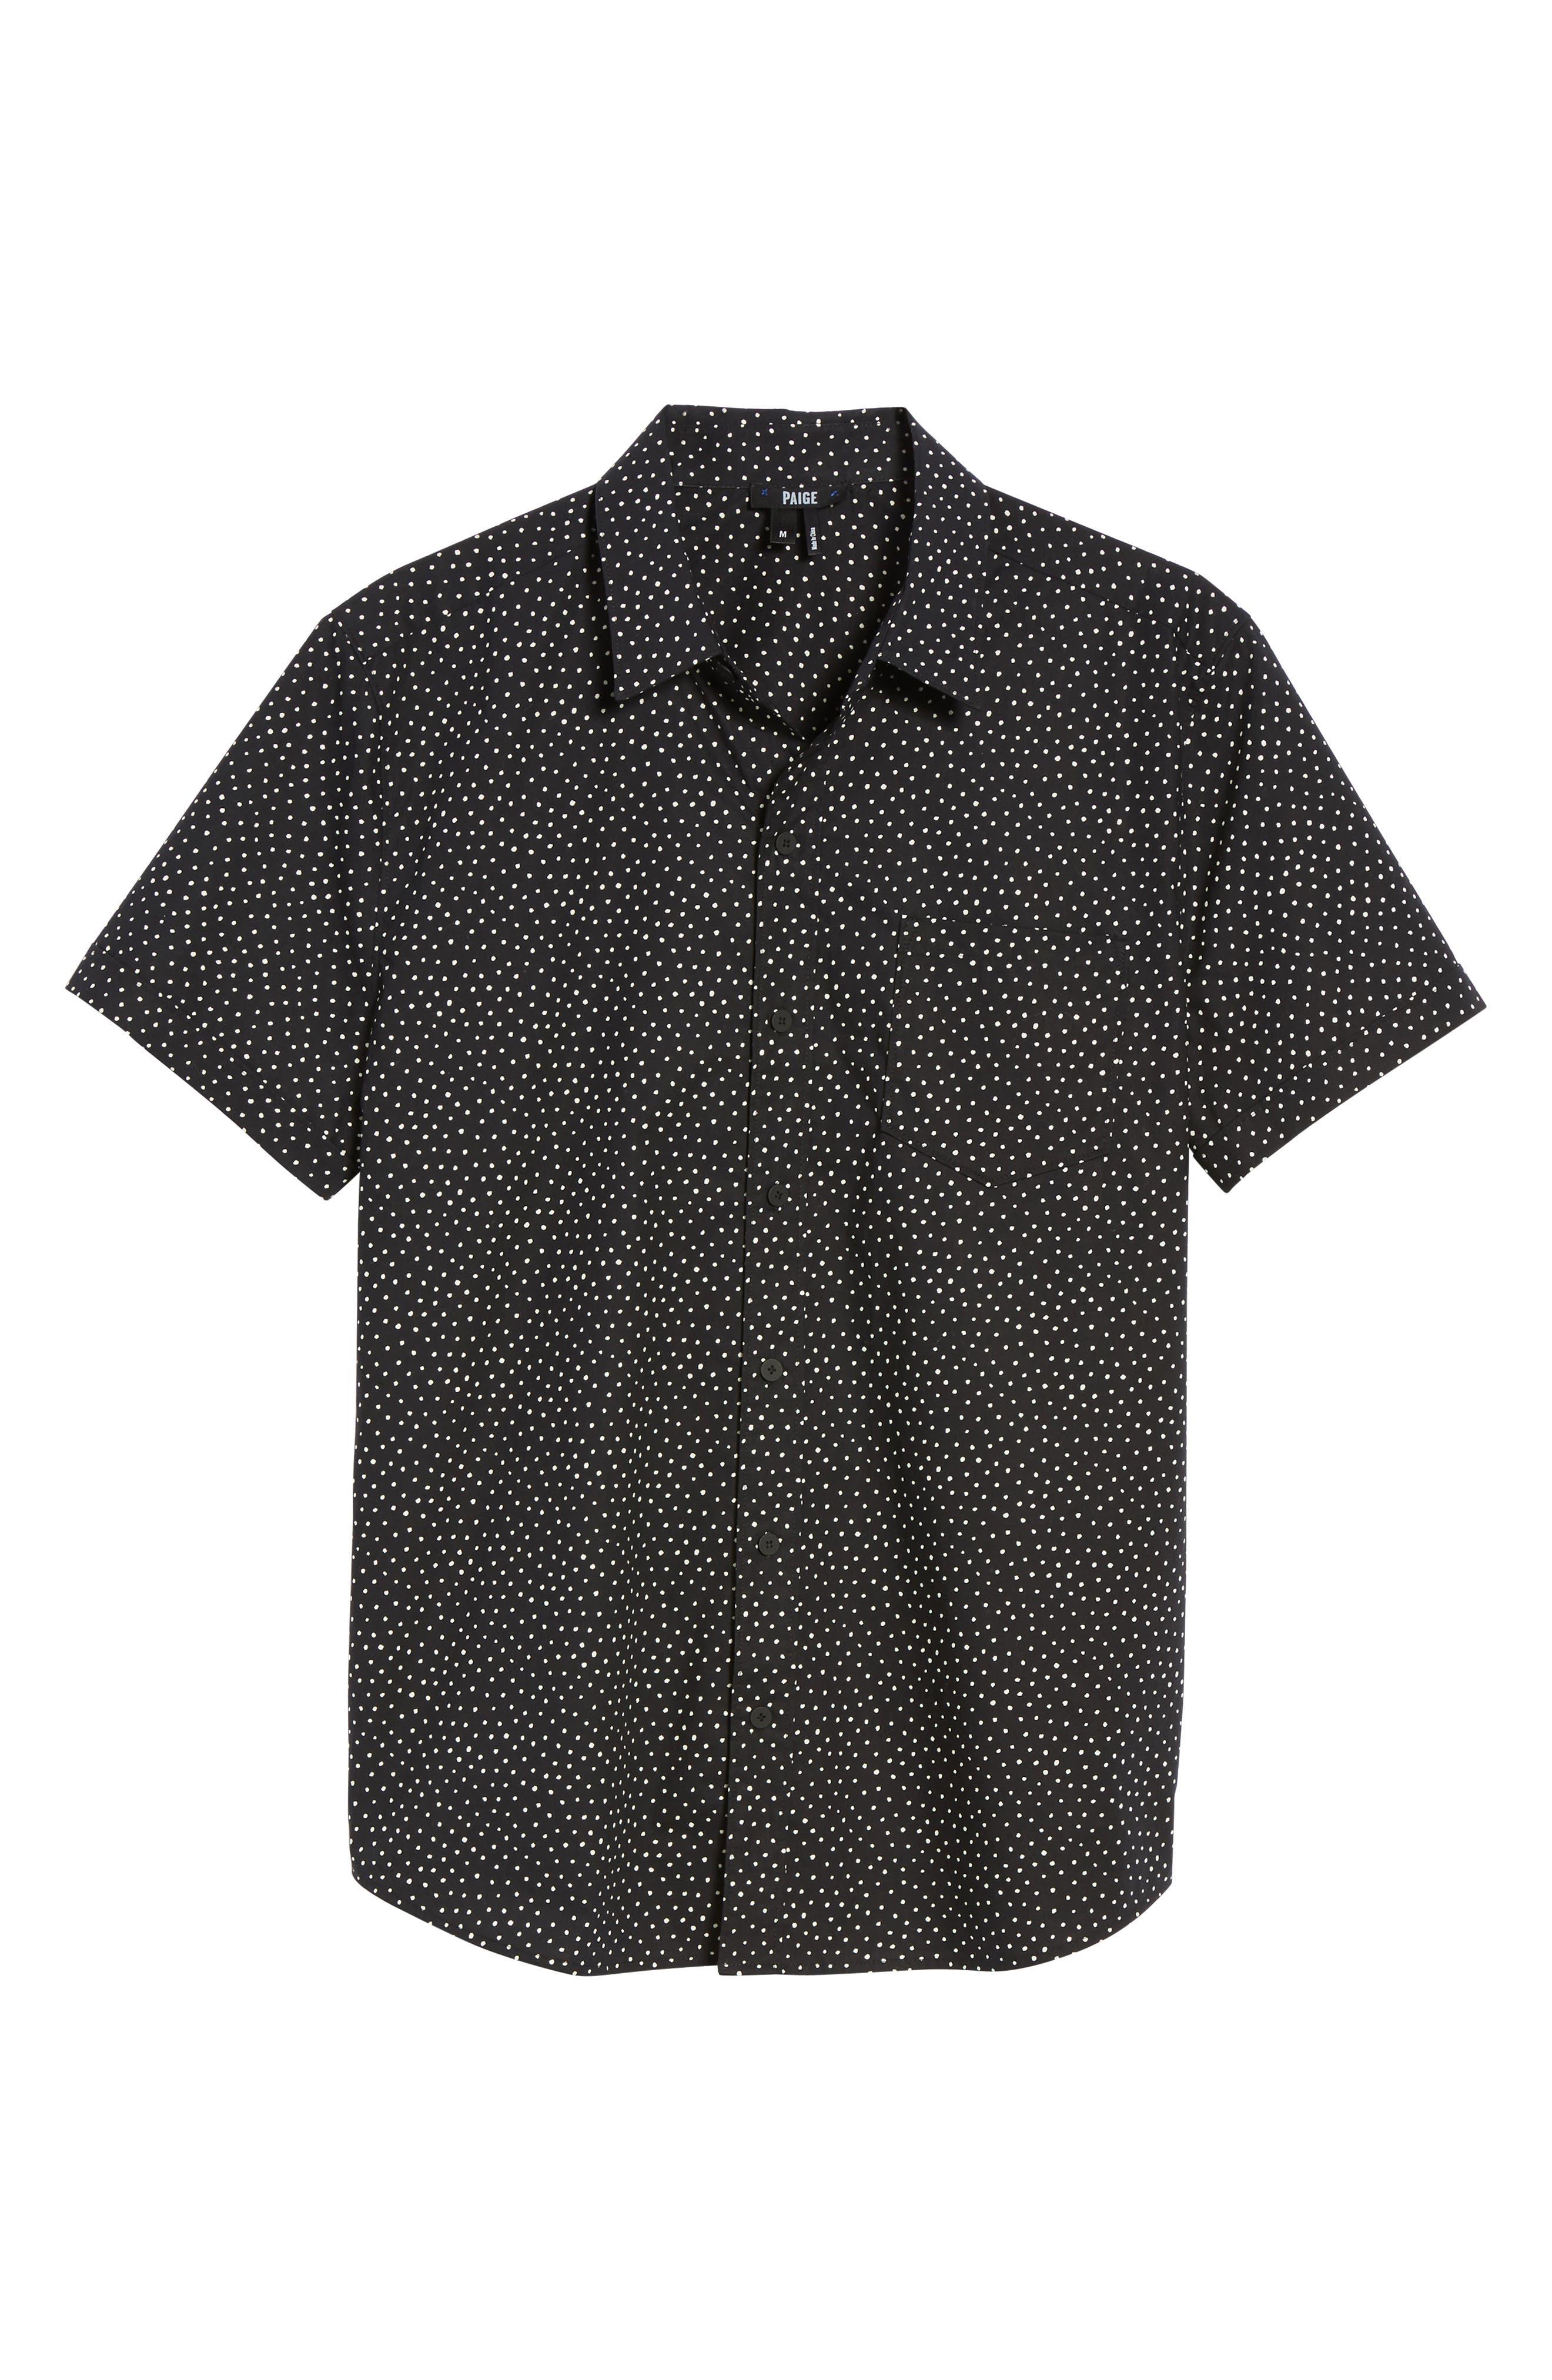 Becker Dot Print Woven Shirt,                             Alternate thumbnail 11, color,